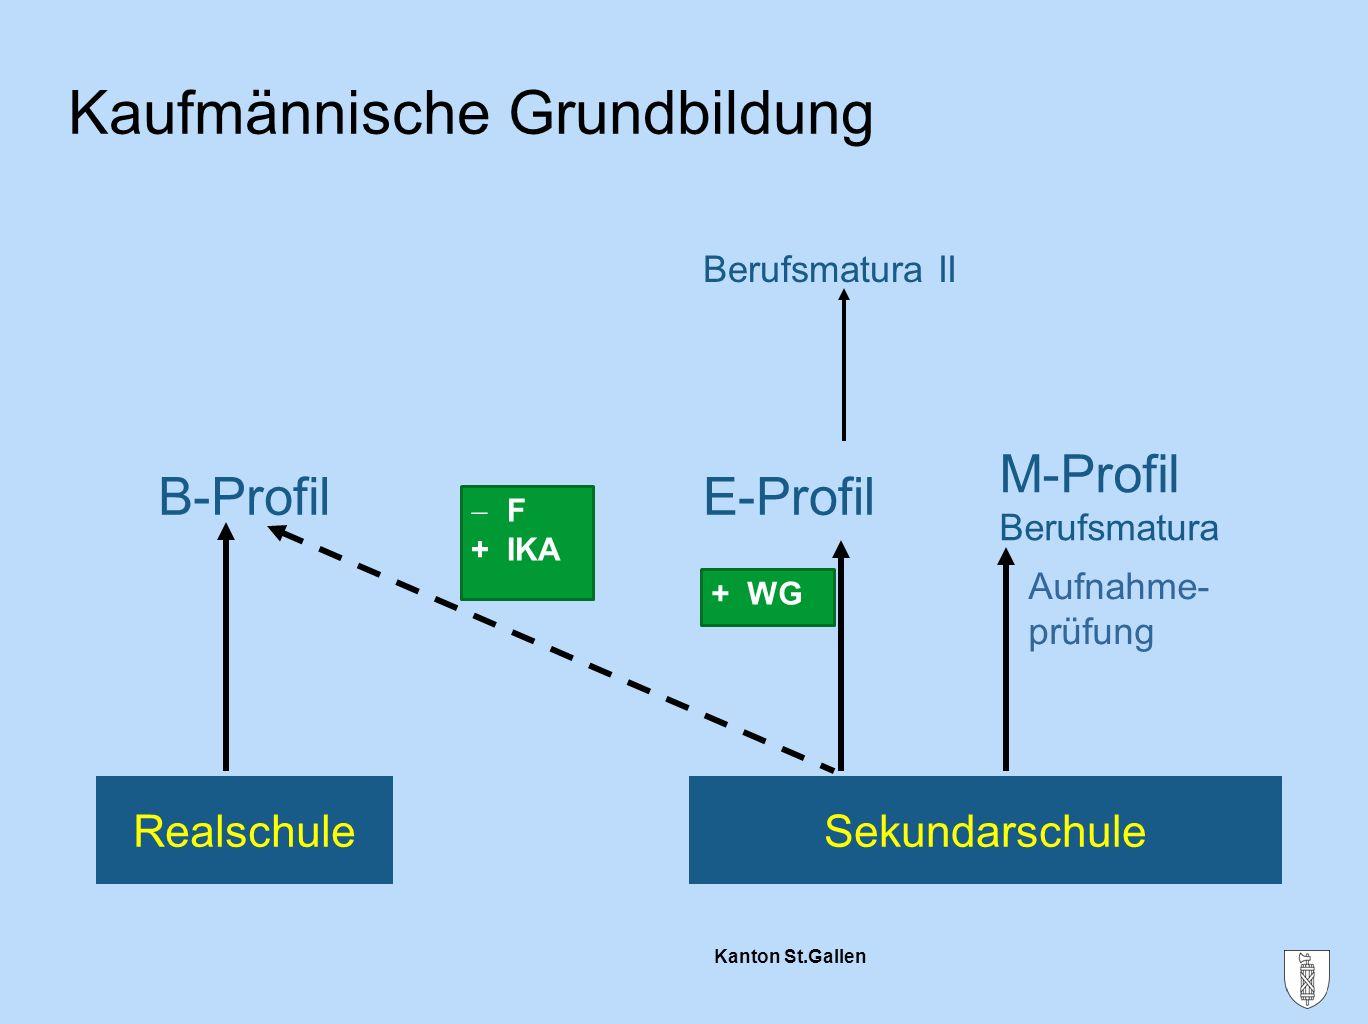 Kanton St.Gallen - F + IKA Kaufmännische Grundbildung Berufsmatura II B-ProfilE-Profil M-Profil Berufsmatura Aufnahme- prüfung RealschuleSekundarschul